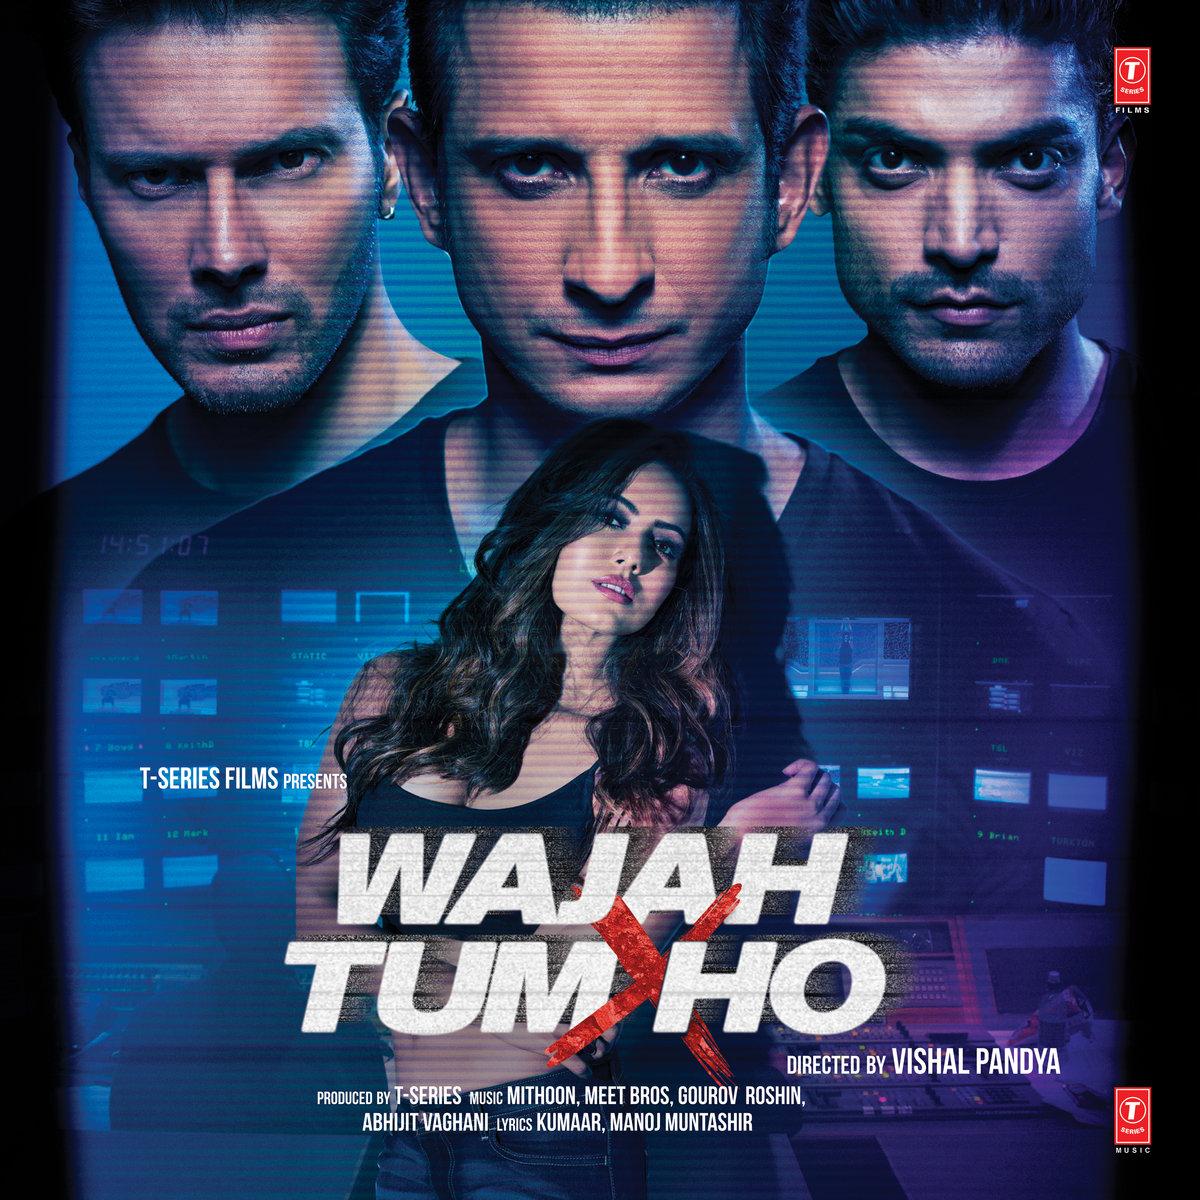 Hindi Movie Sirf Tum 3gp Download Diatholcompfi